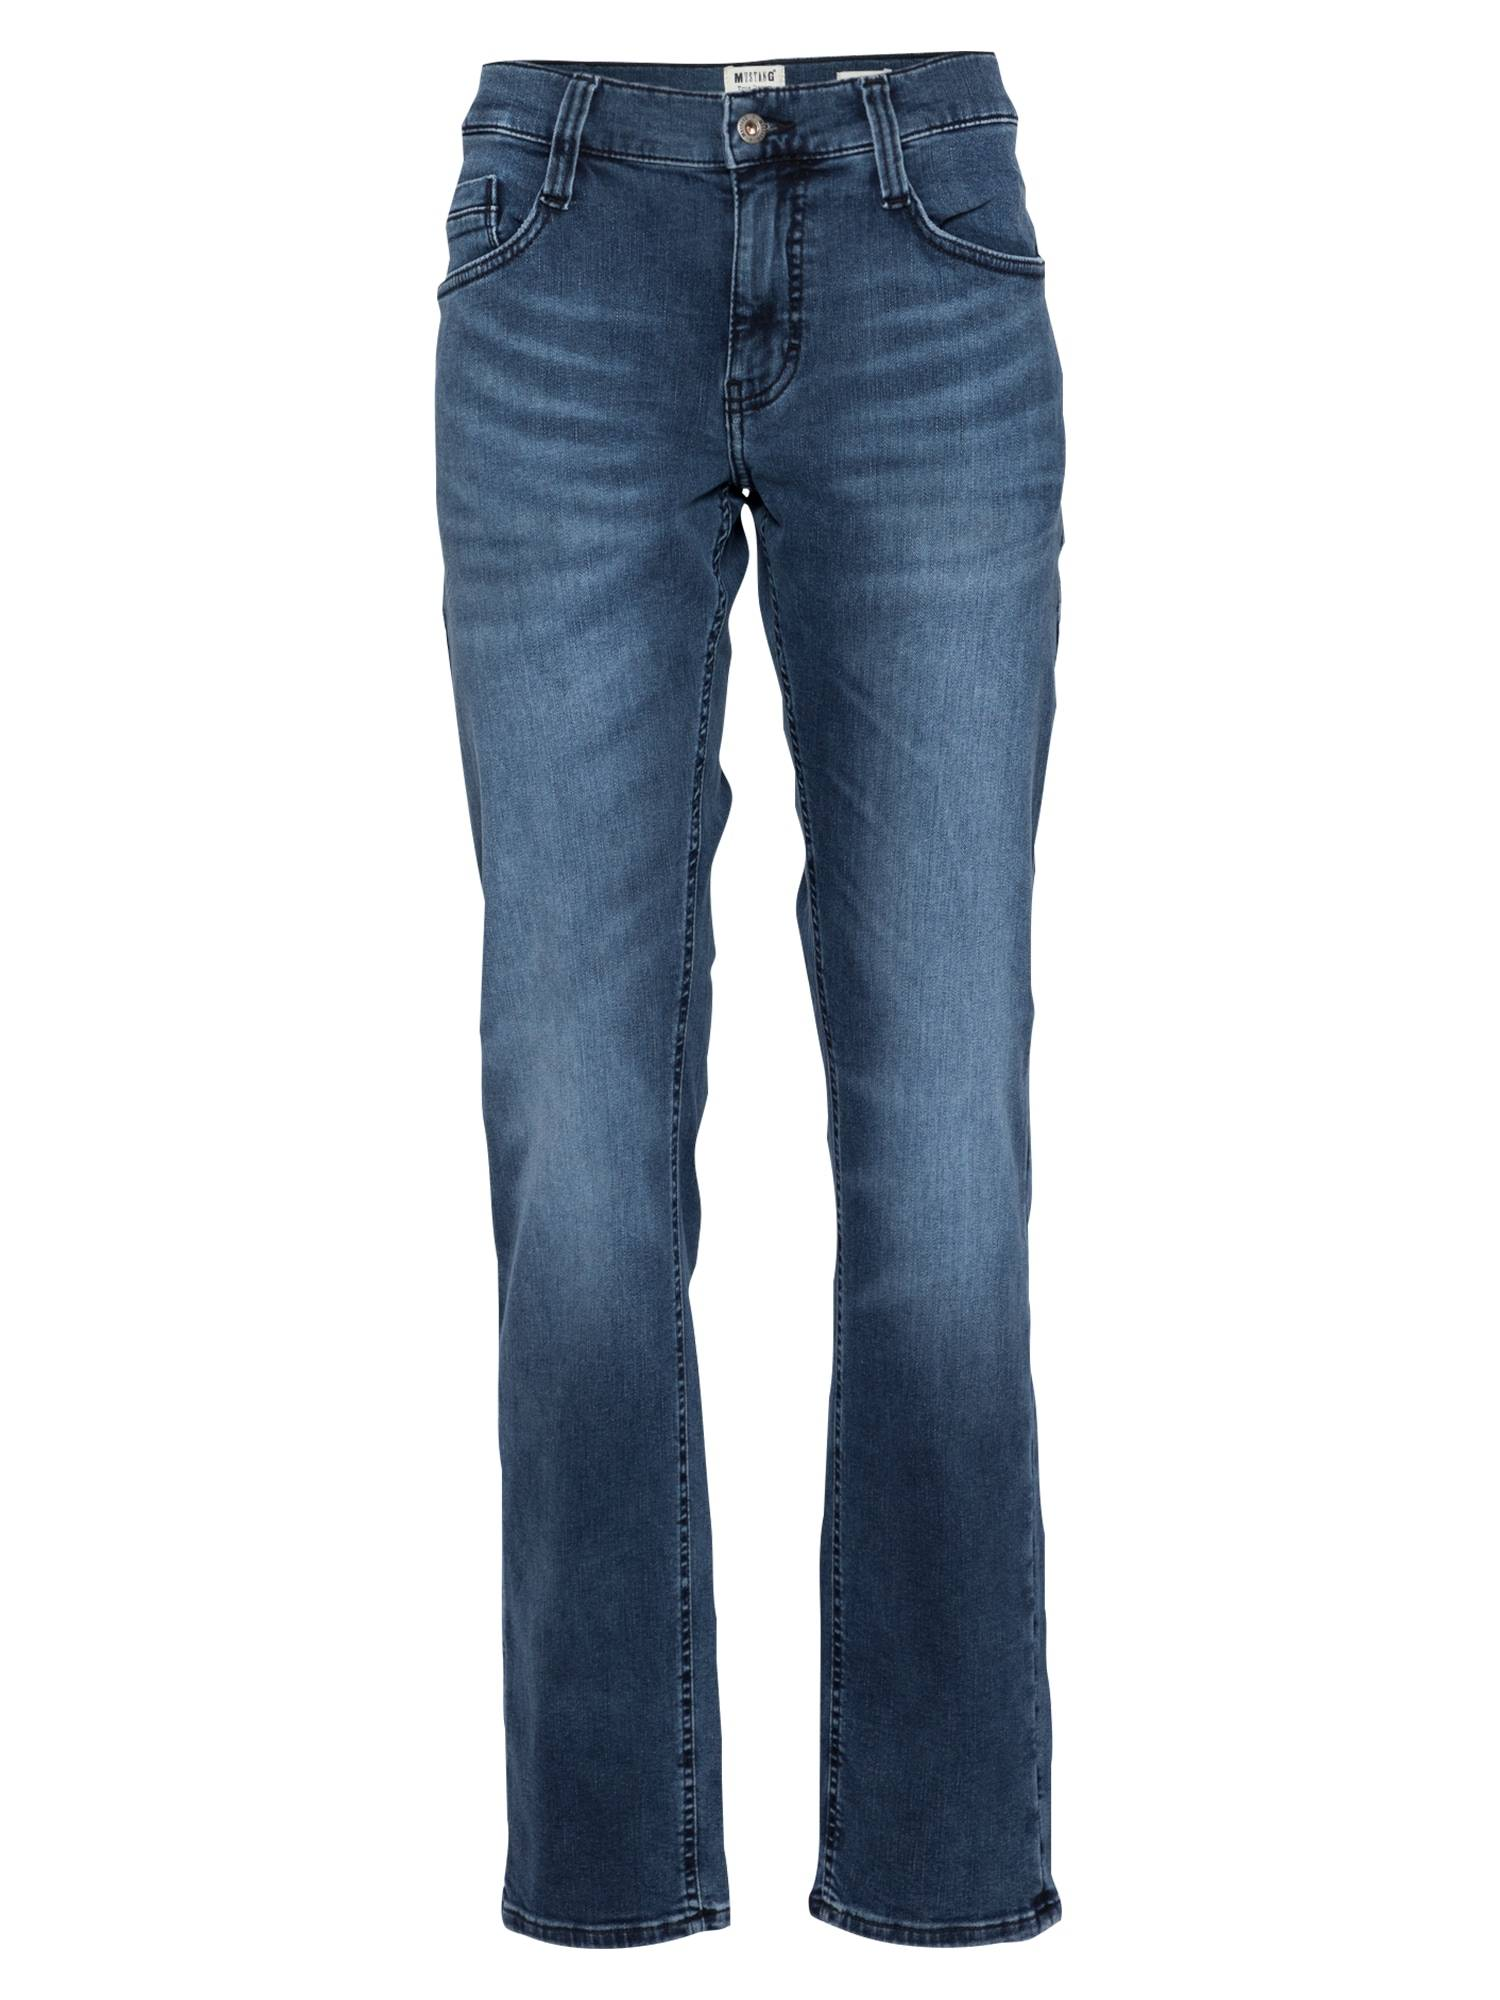 MUSTANG Jean 'Oregon'  - Bleu - Taille: 32/30 - male